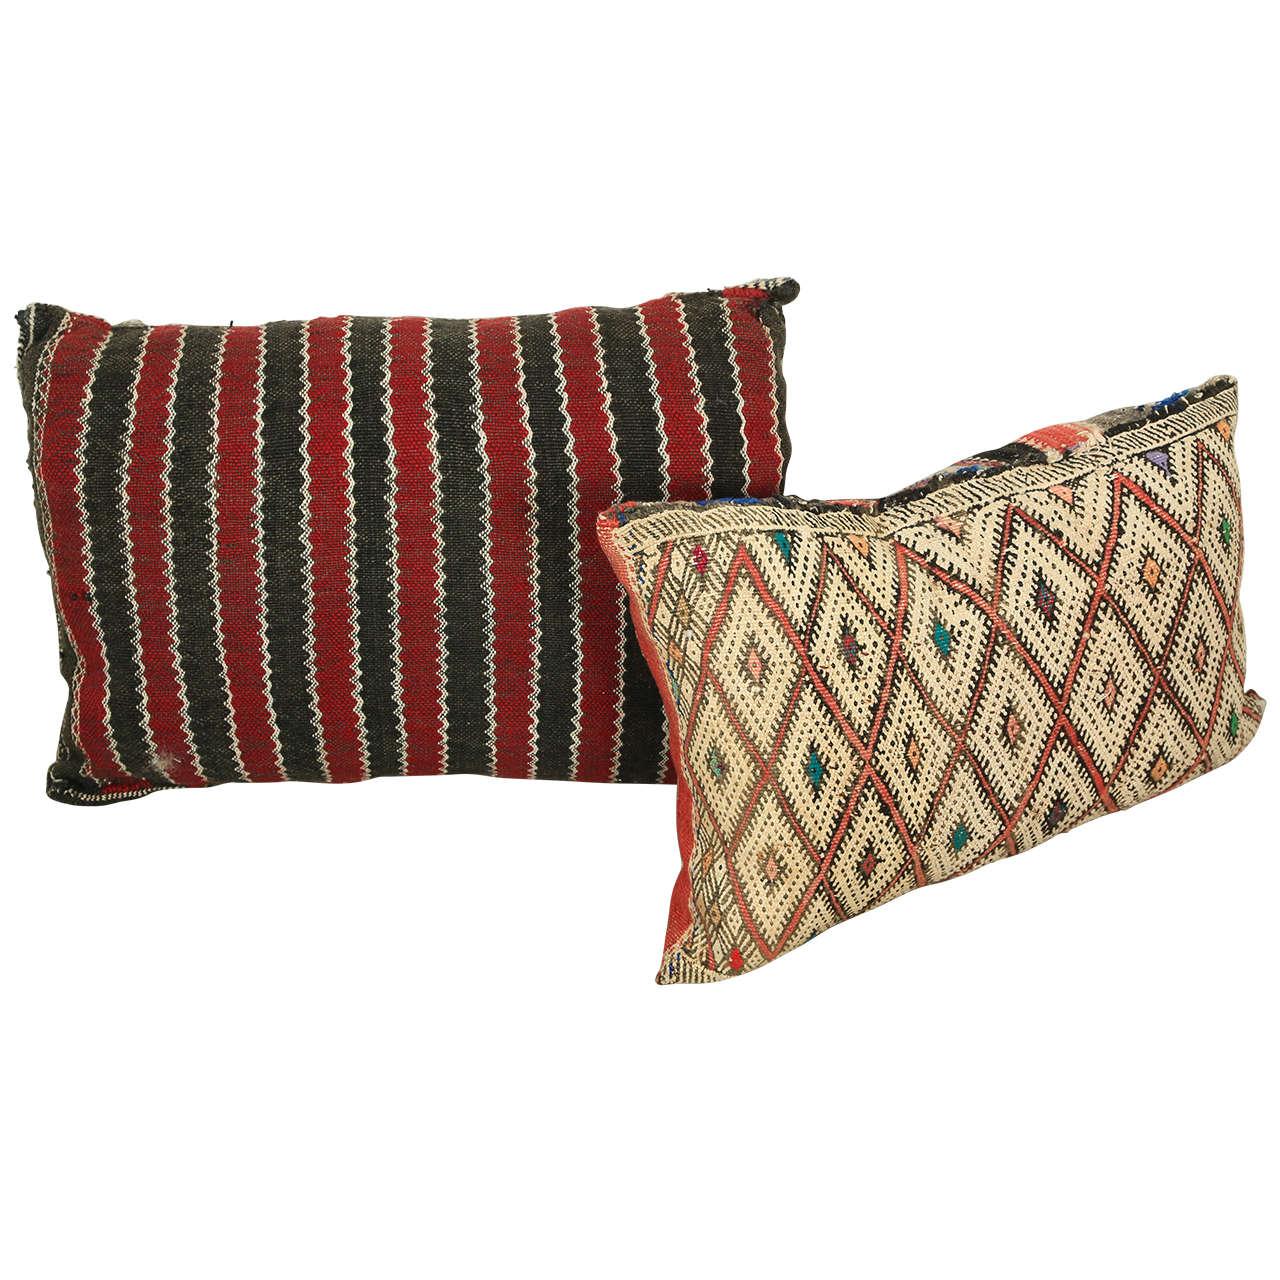 Hand-made Moroccan tribal rug pillows, 1940